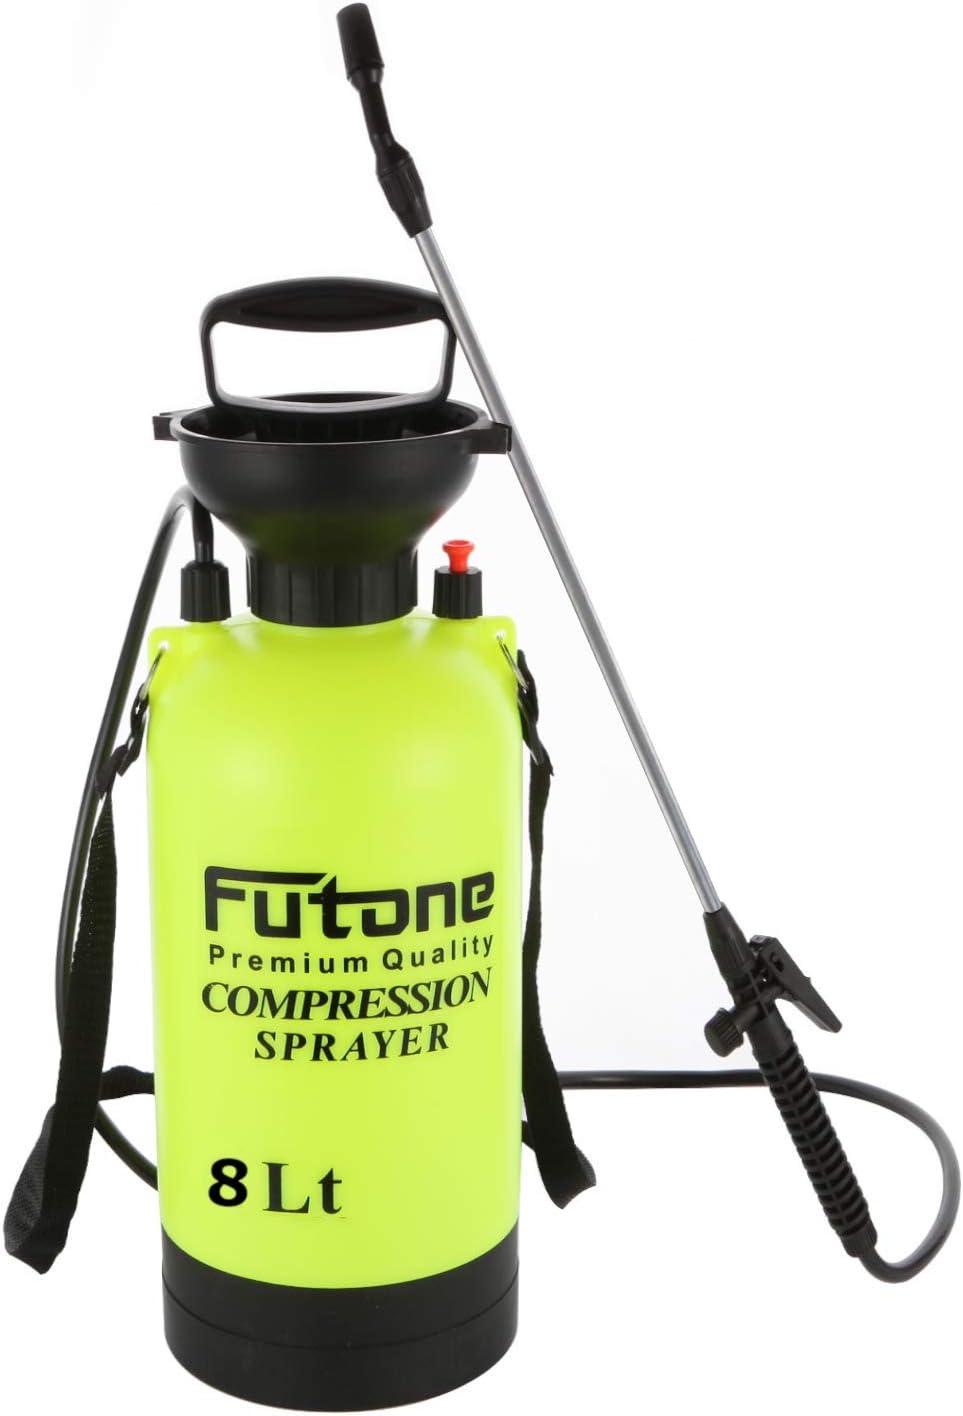 Futone 2.0 Gallon Garden Sprayer and Adjustable Shoulder Strap